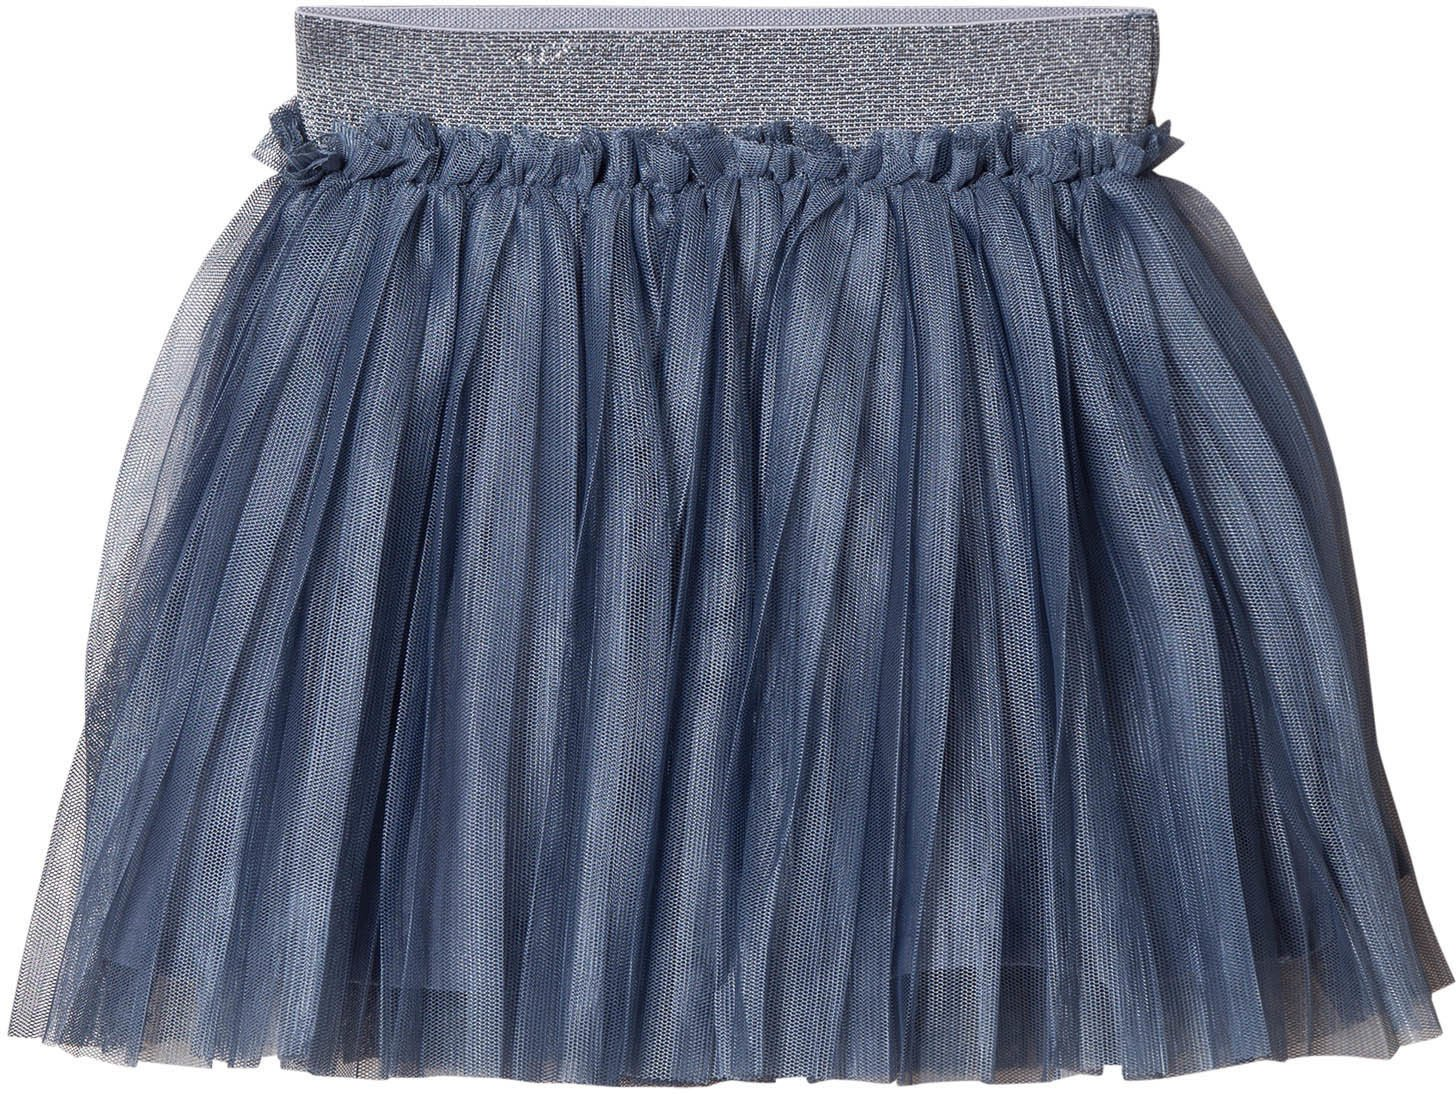 Noa Noa Miniature Skirt Short